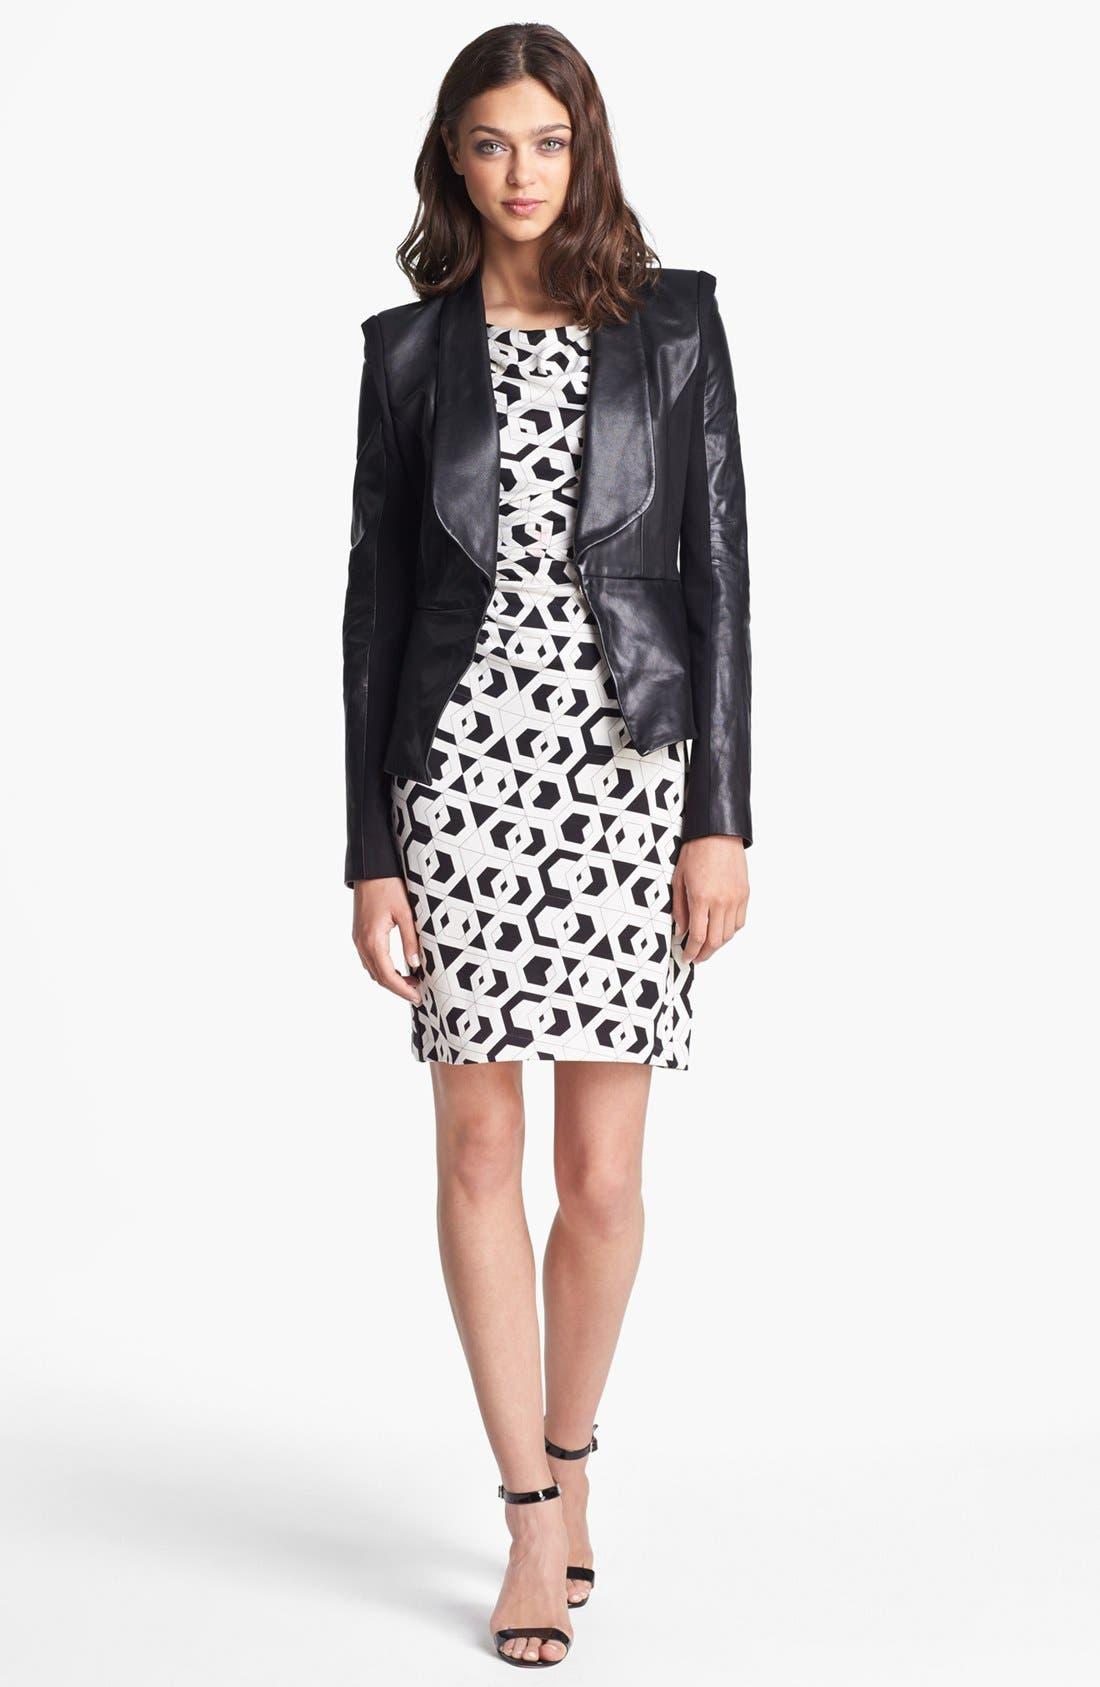 Alternate Image 1 Selected - Rebecca Minkoff 'Rebecca' Leather & Knit Jacket